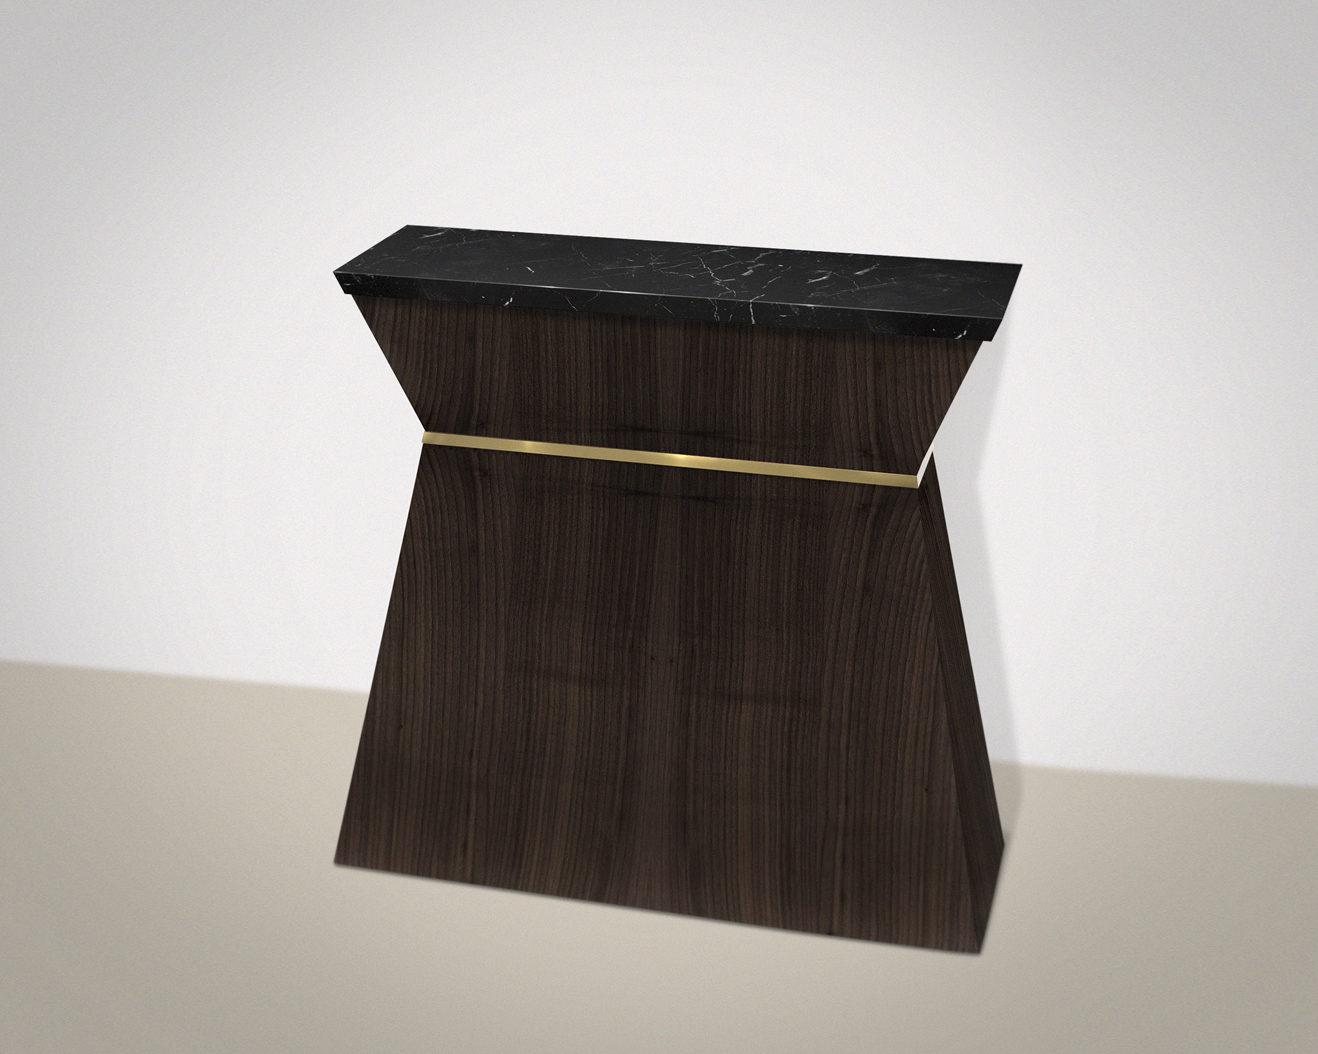 forme-console-eucleia-savannah-bay-design